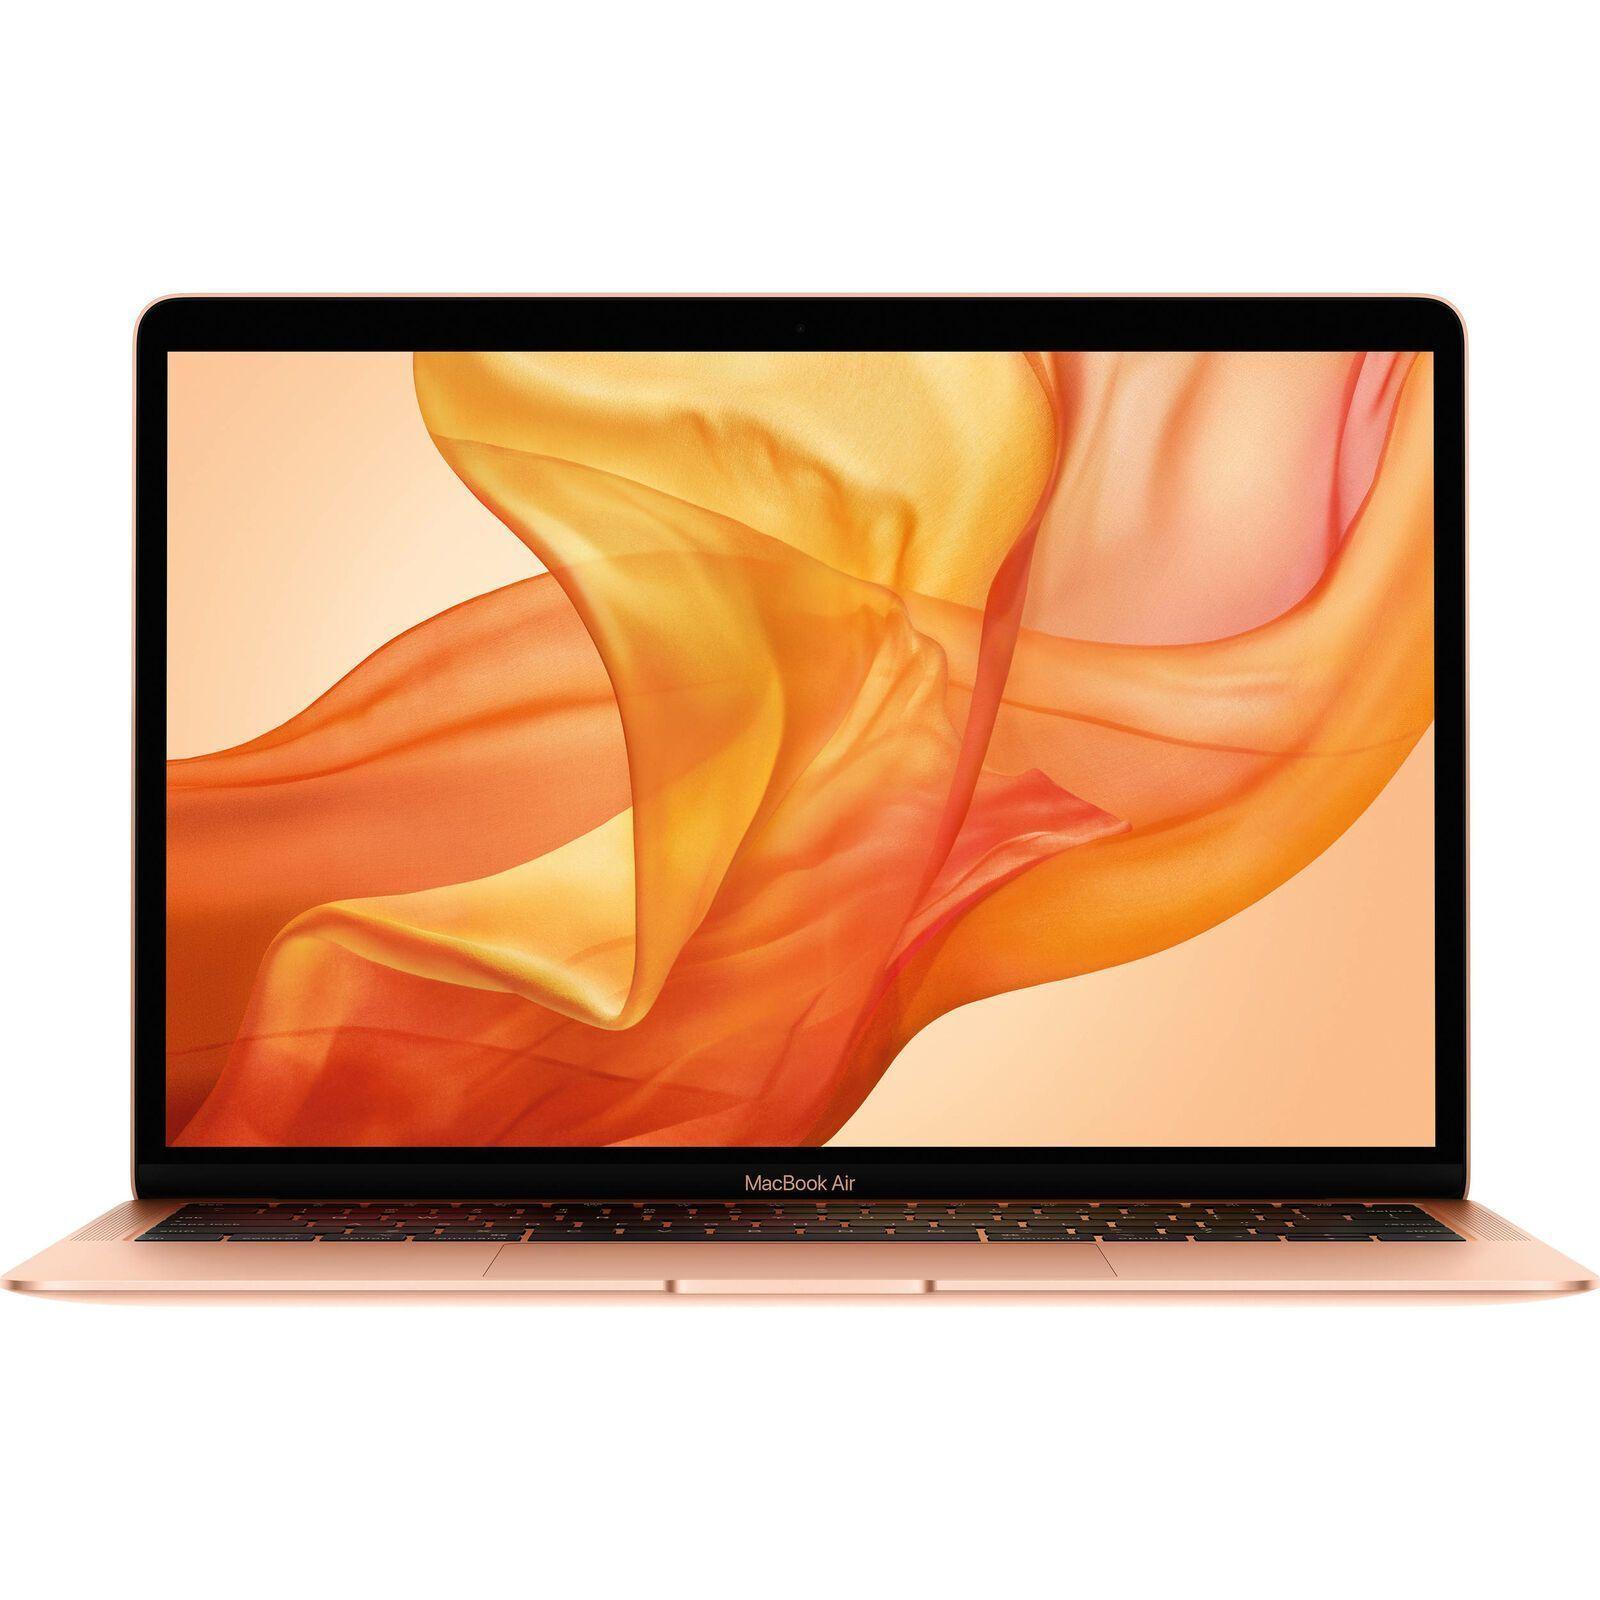 New 2019 Apple Macbook Air 13 3 Retina Touch Id Intel I5 8gb 128gb Ssd Laptop 974 85 End Date In 2020 Macbook Air 13 Inch Macbook Air Retina New Macbook Air